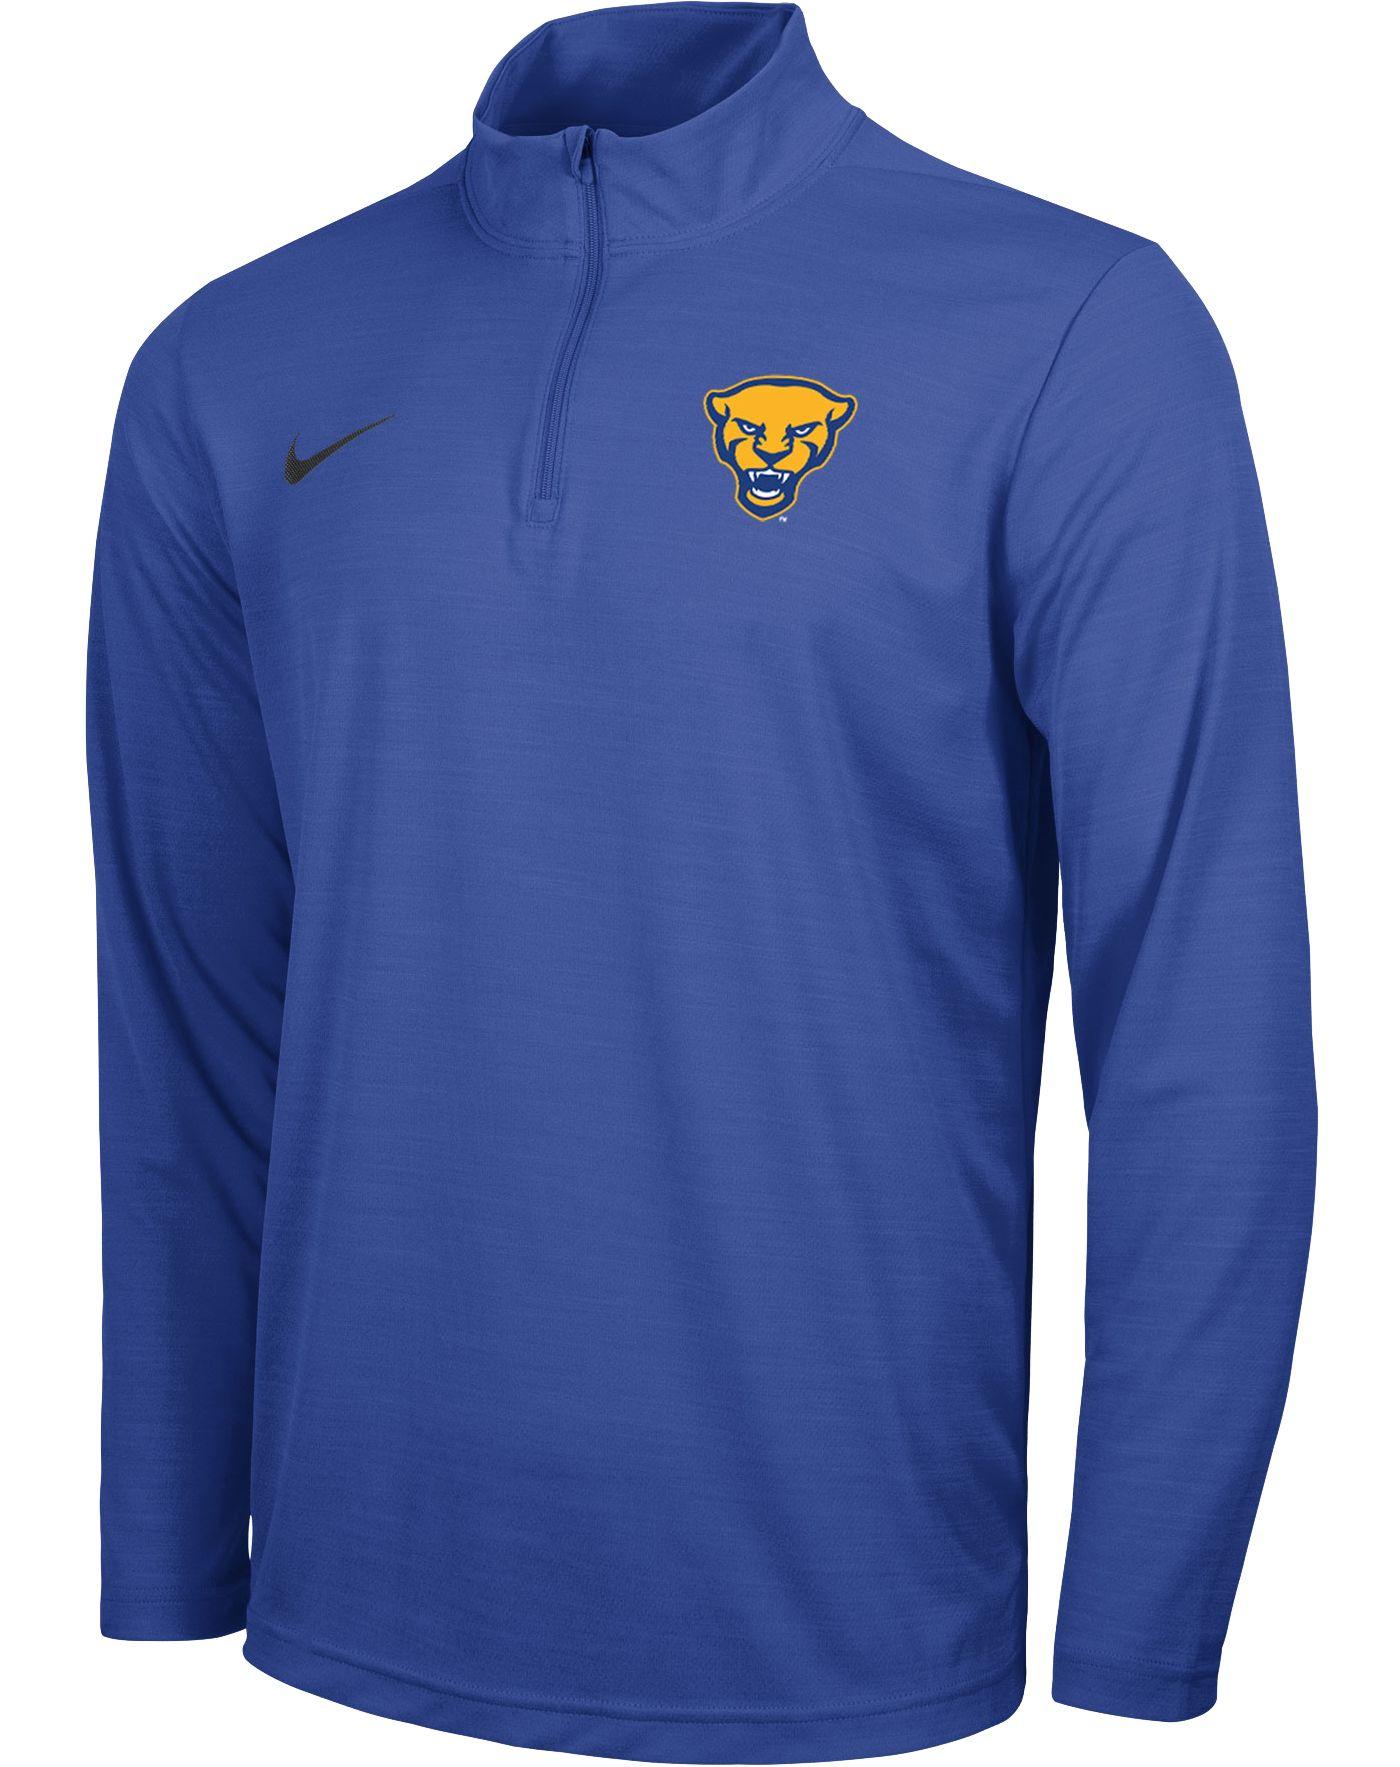 Nike Men's Pitt Panthers Blue Intensity Quarter-Zip Top